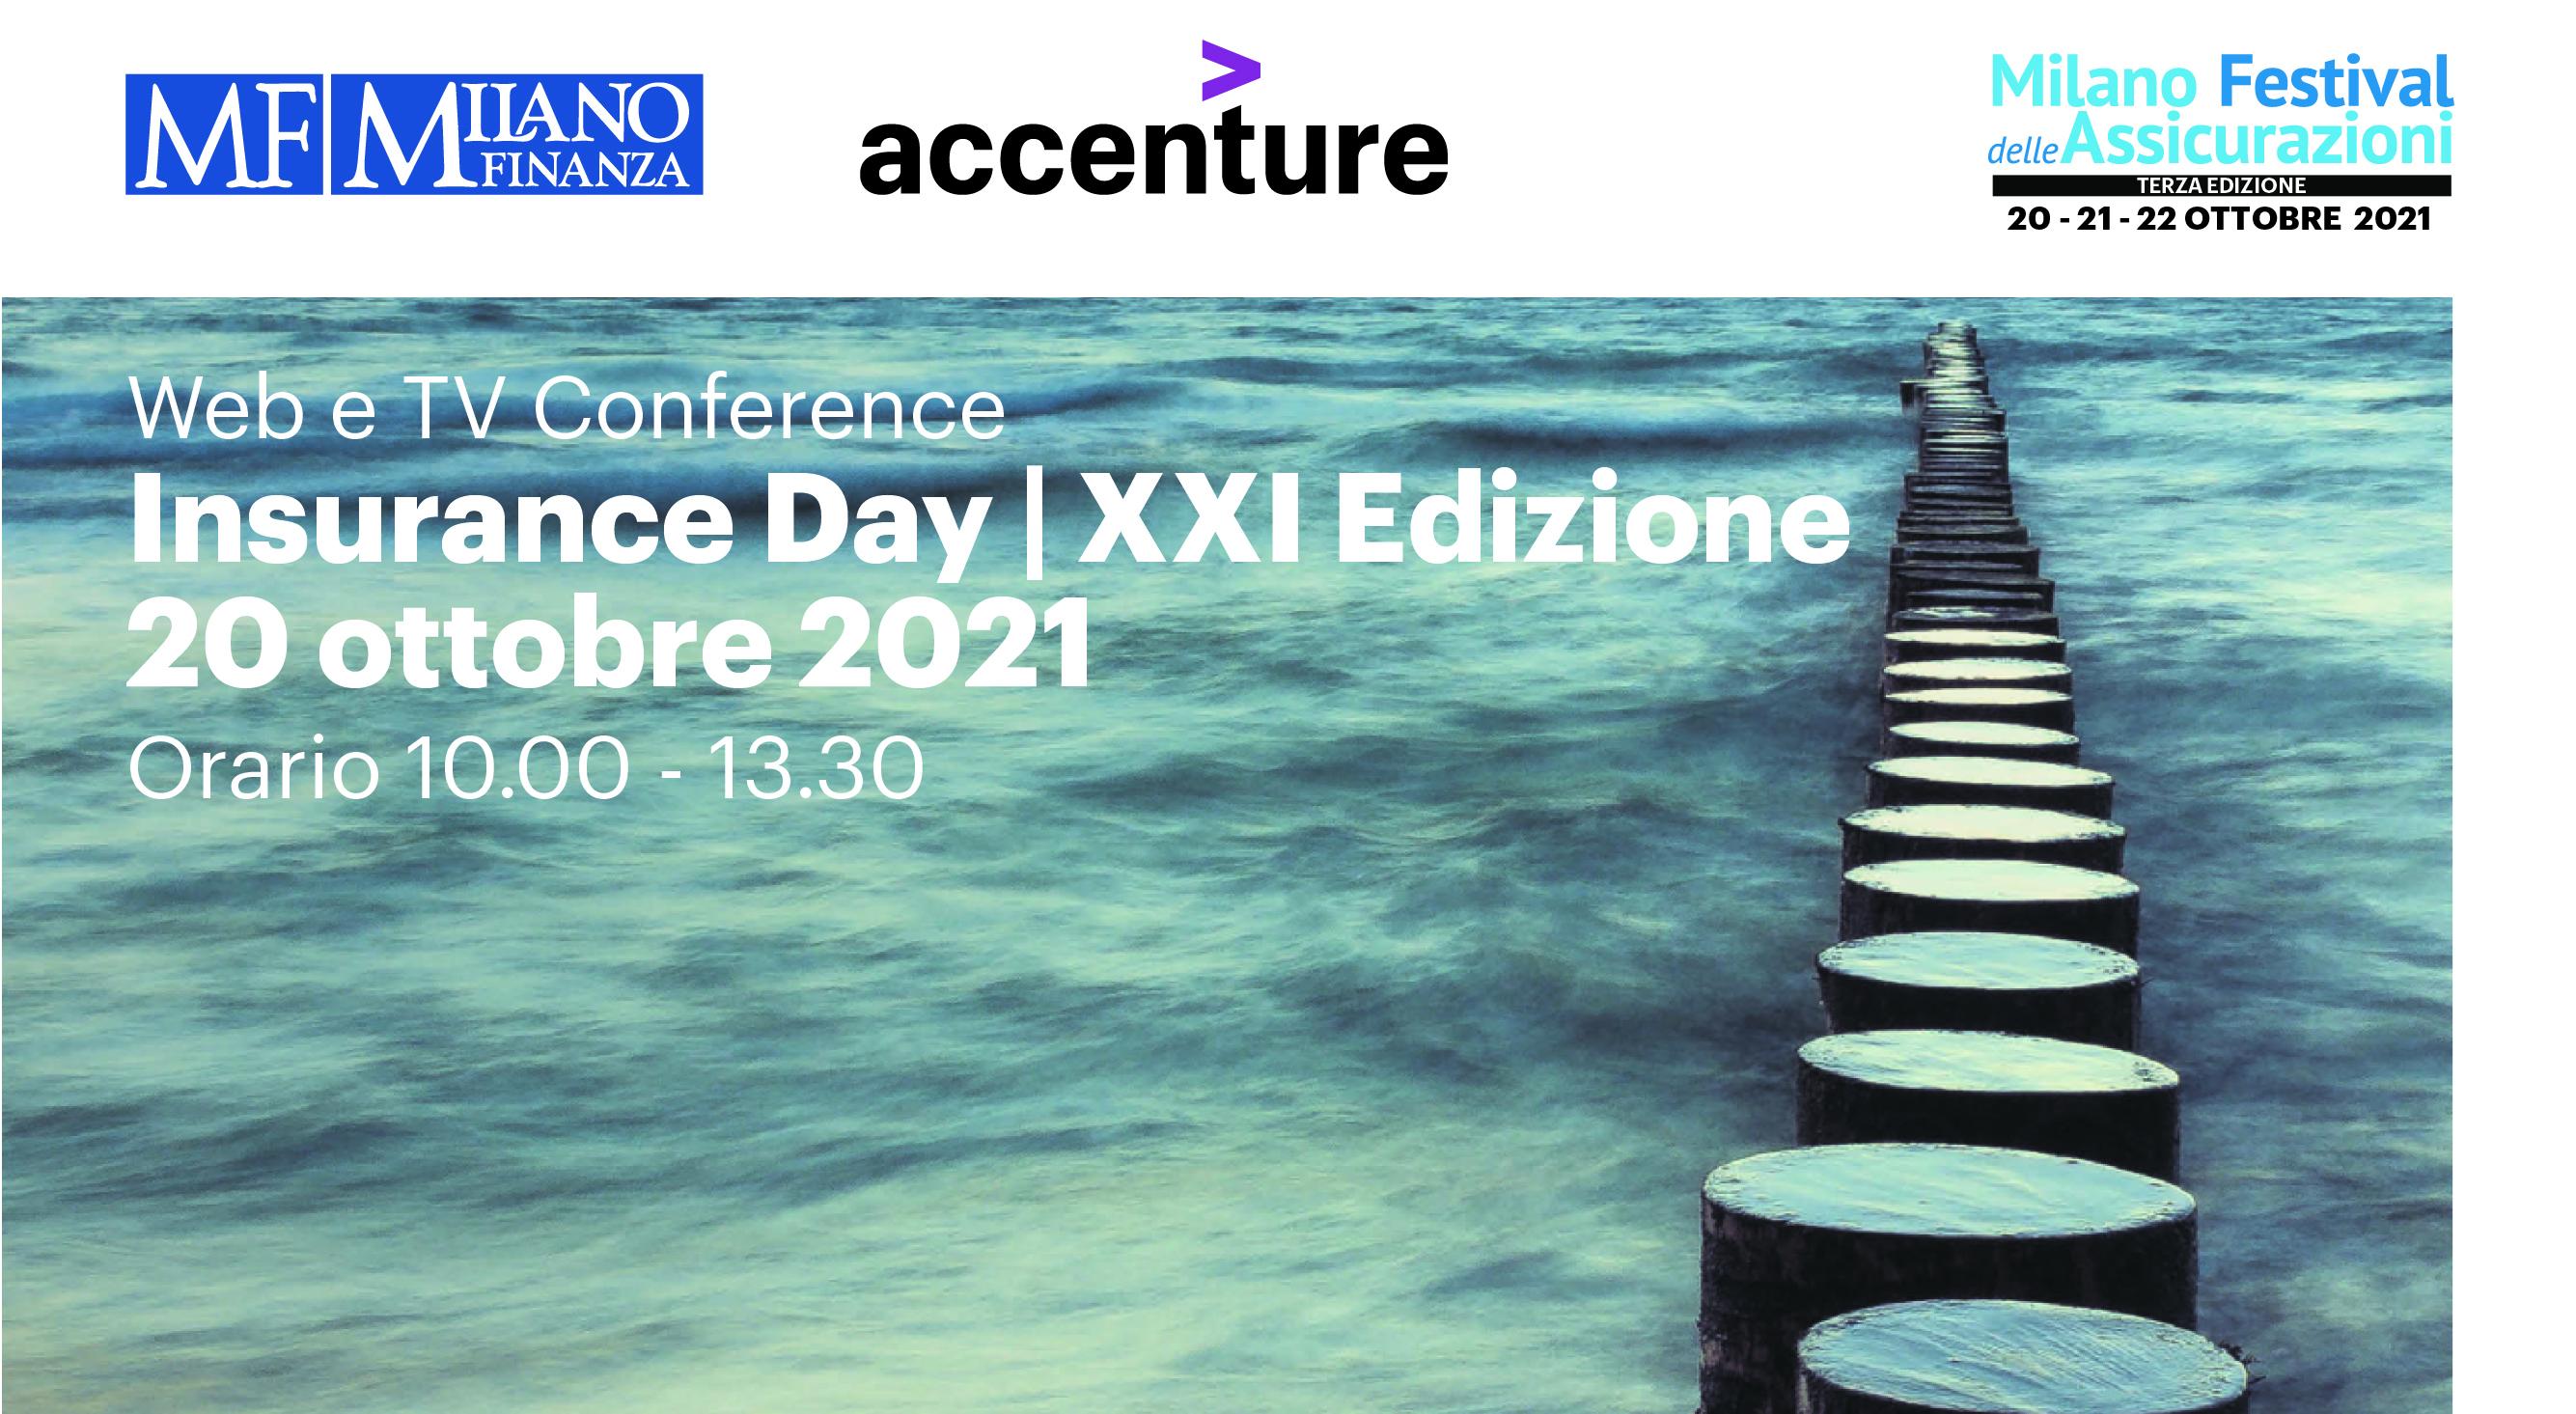 Insurance Day 2021 - Next Generation Insurance